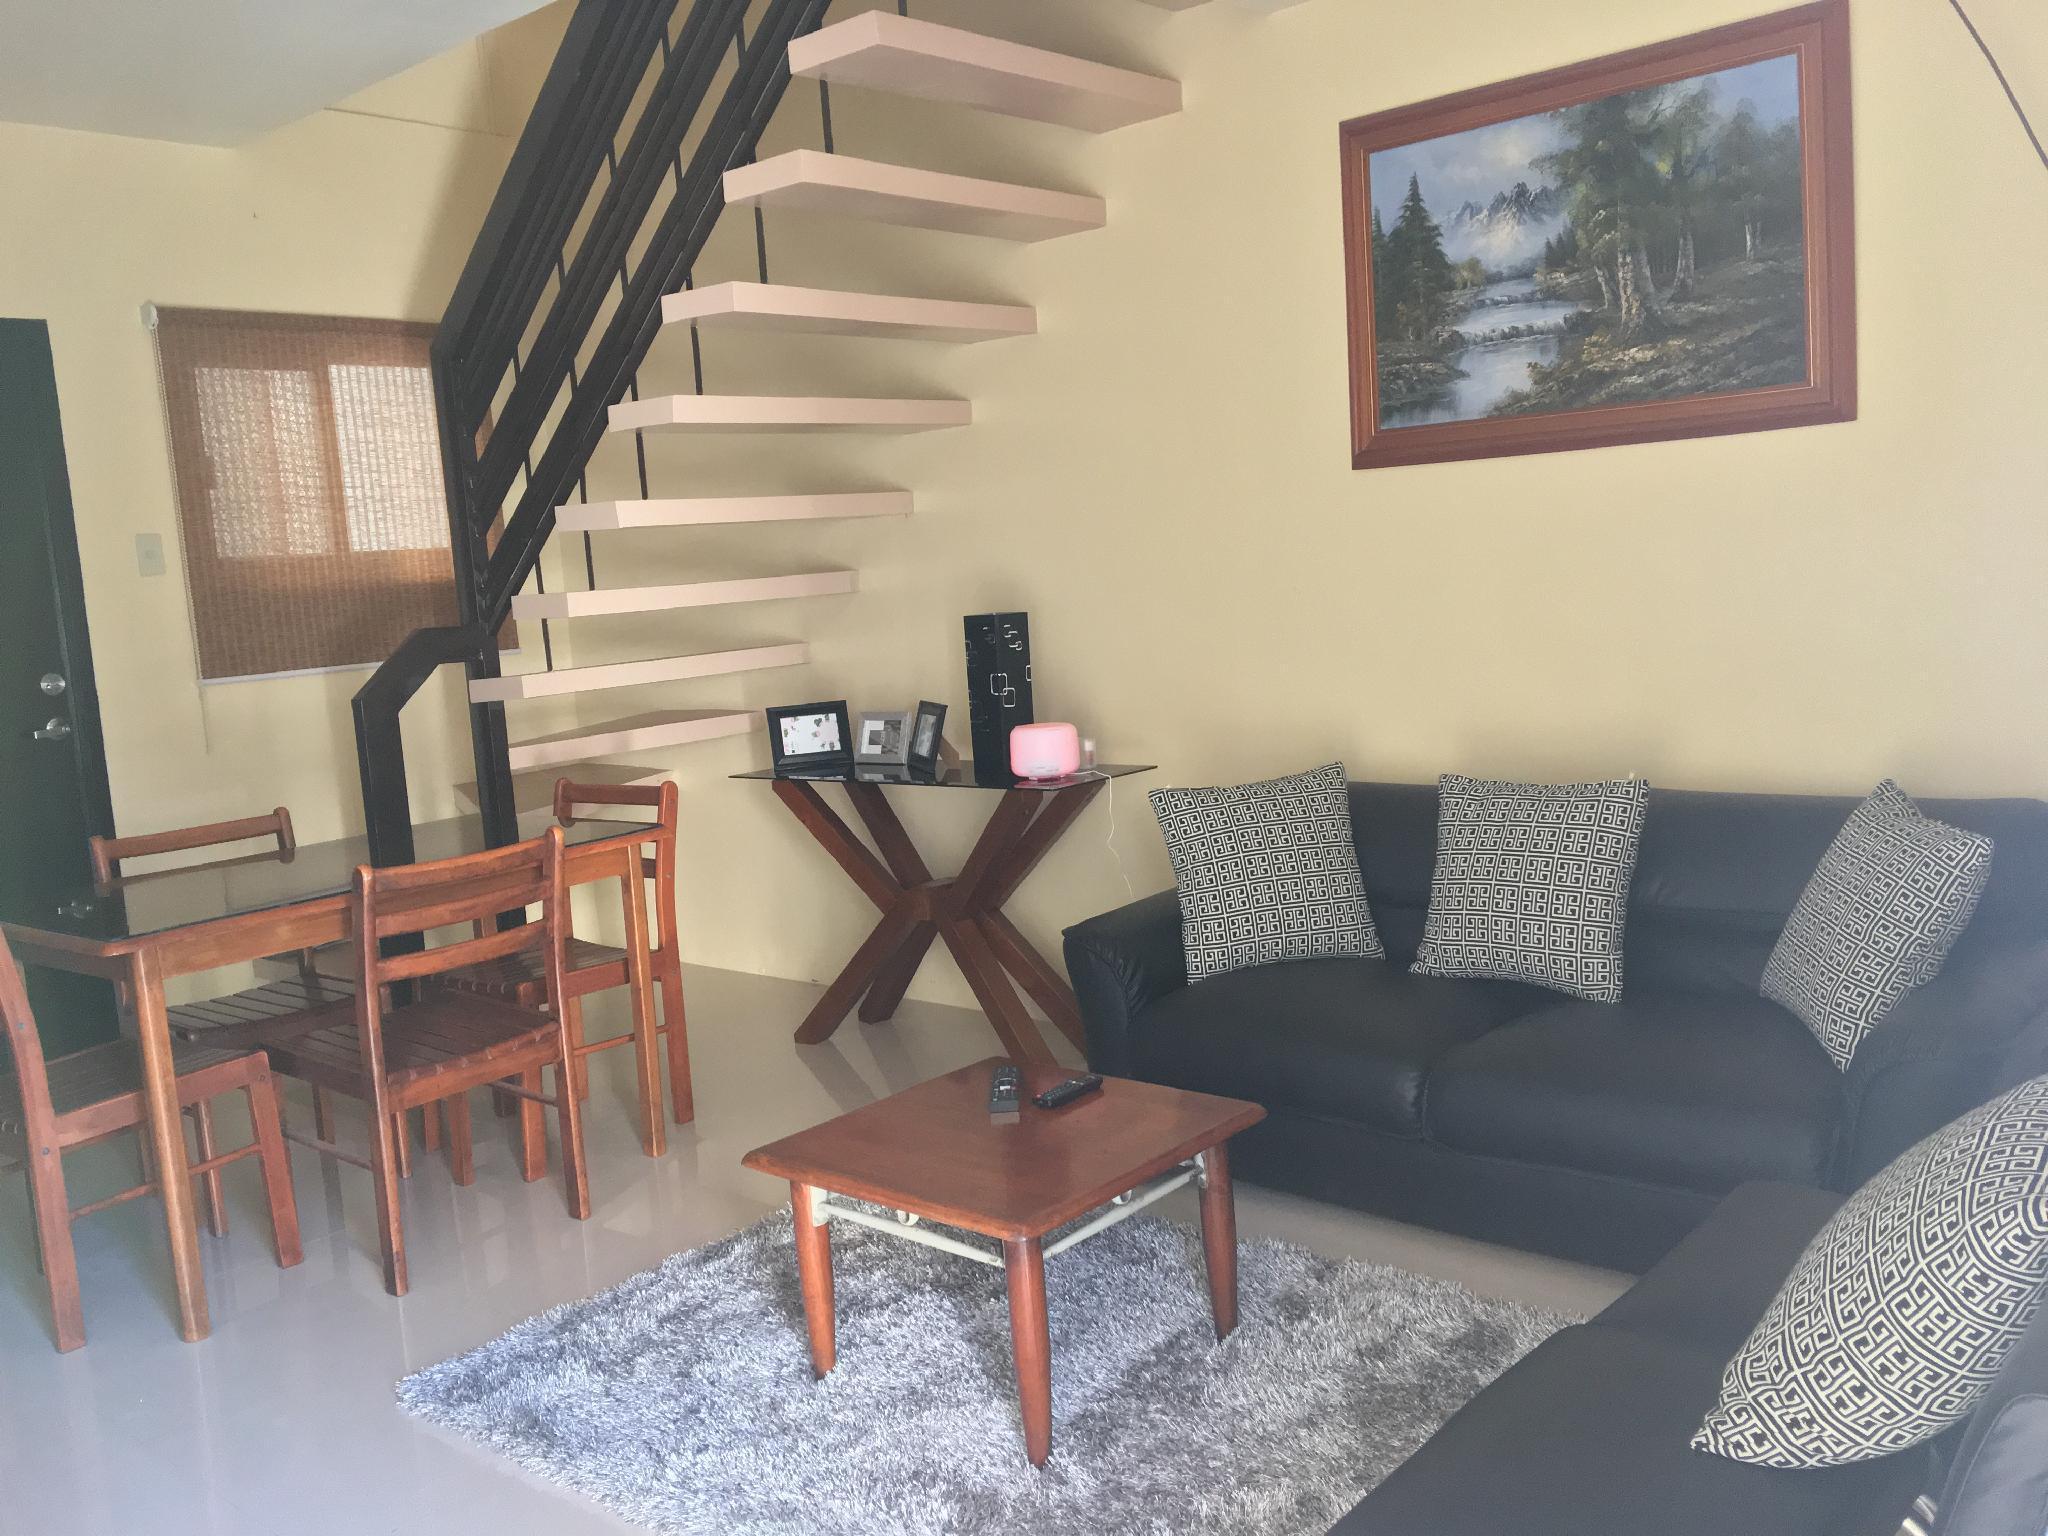 Unit J-5, 2BR House @Tagaytay Hampton Villa